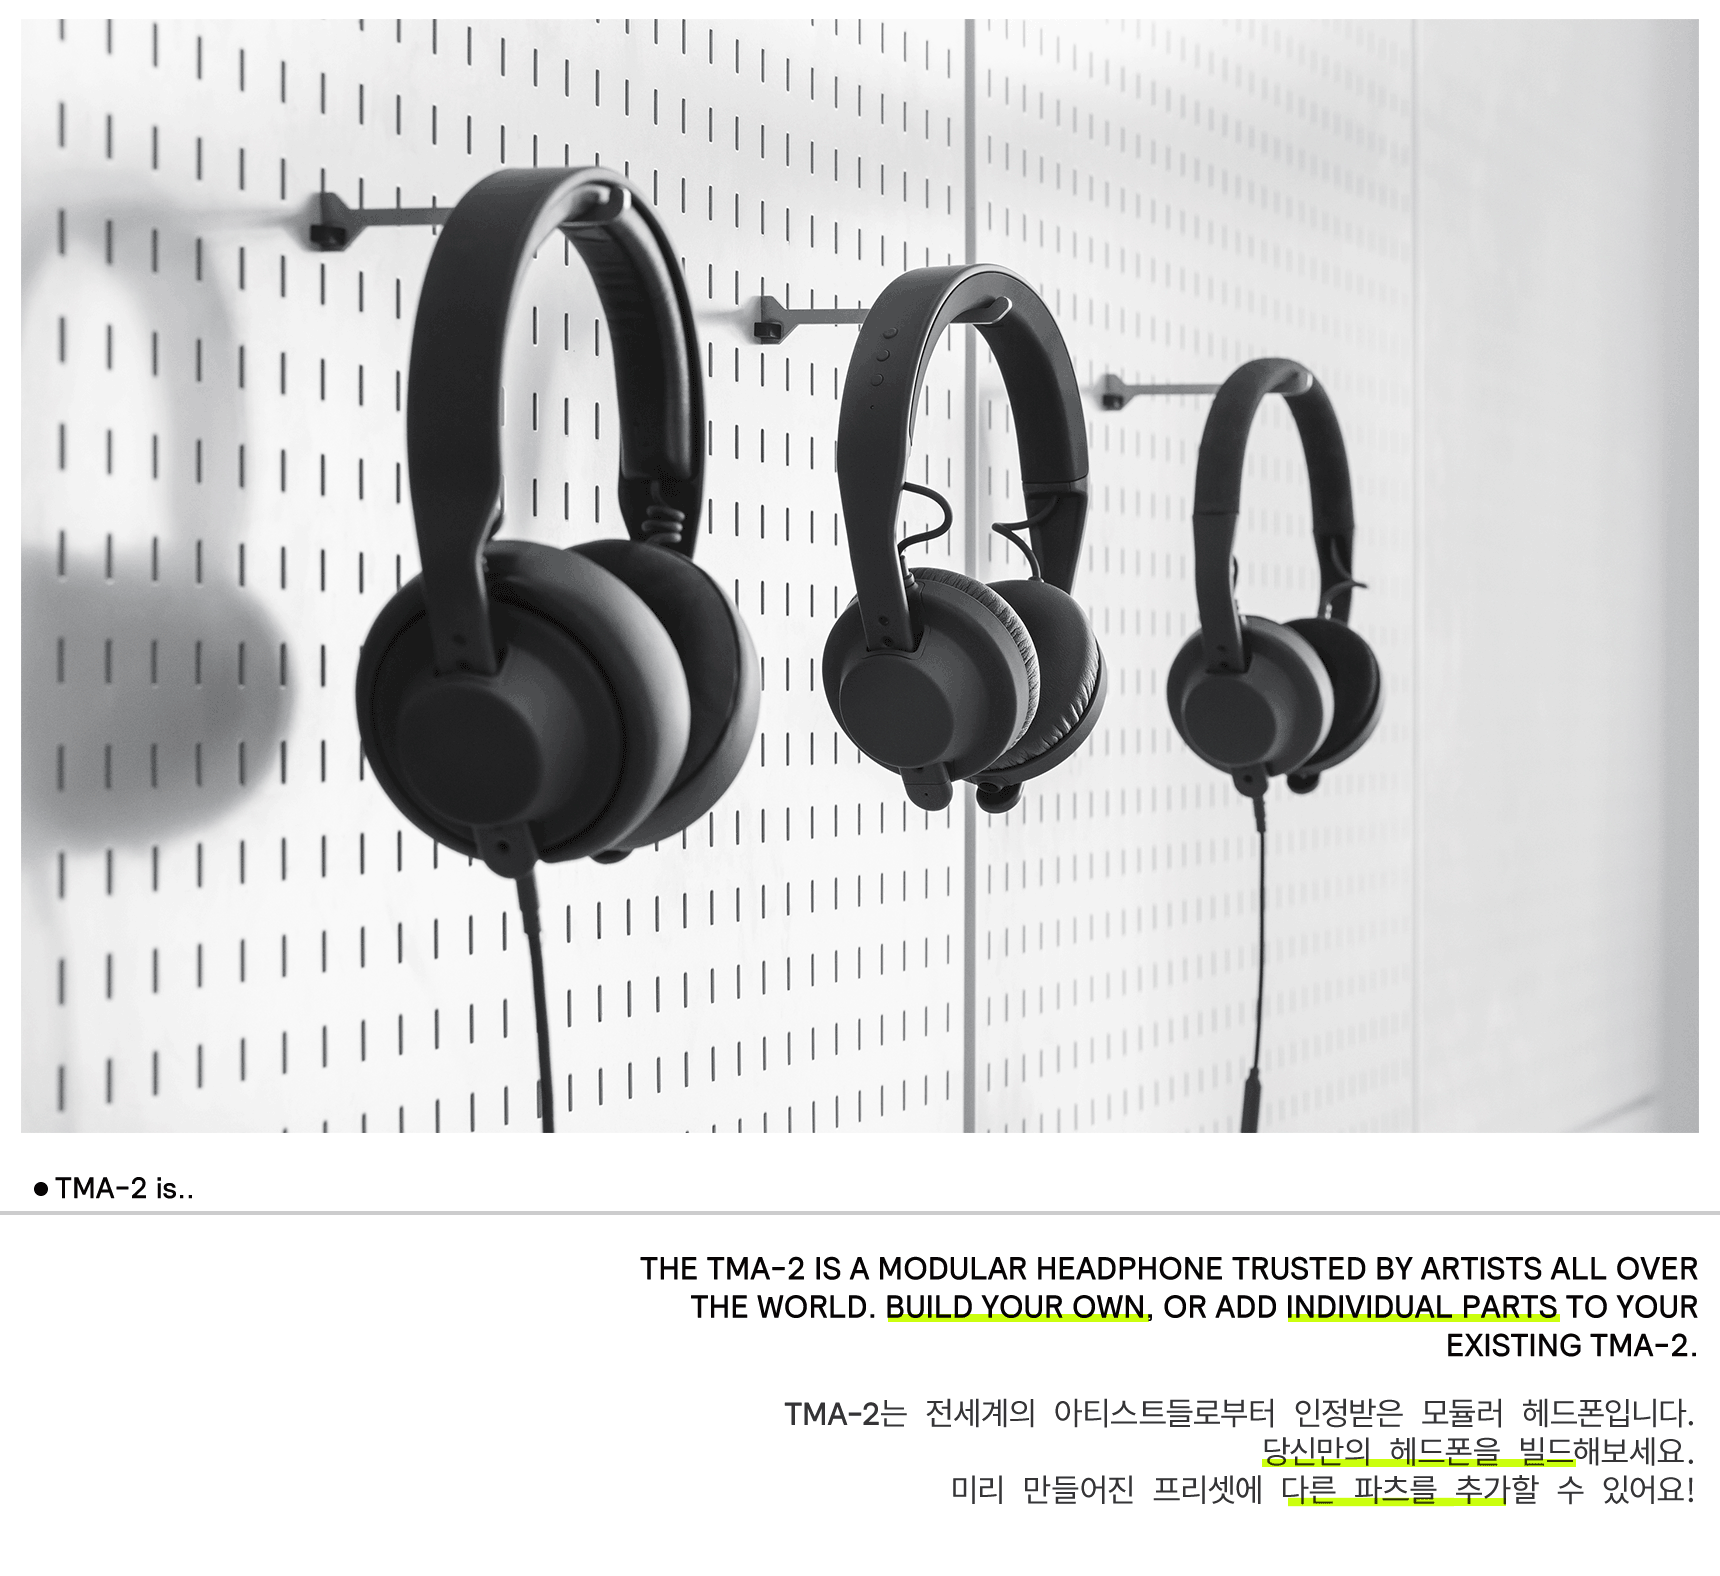 2tma-2cc